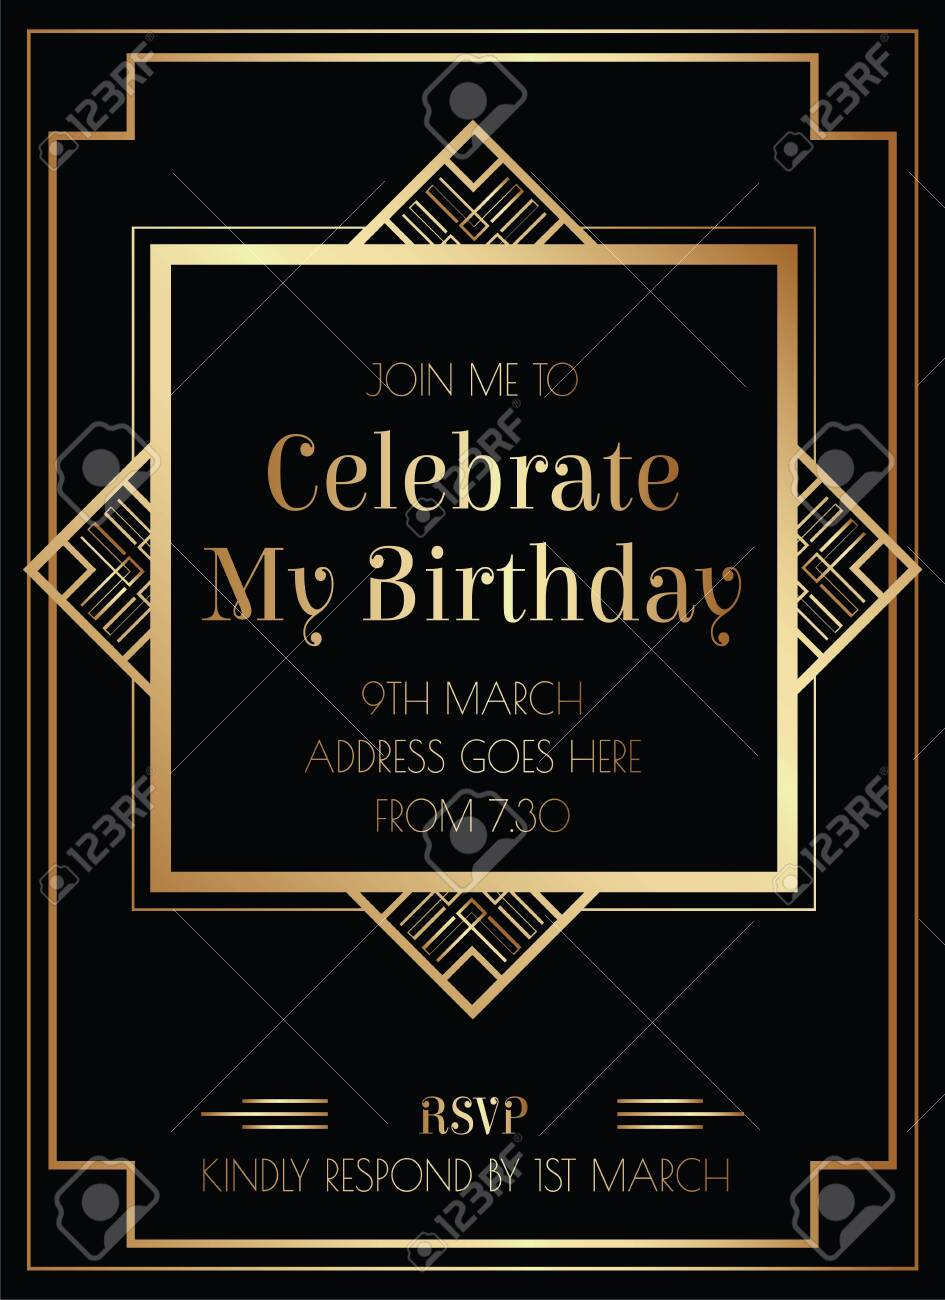 Geometric Gatsby Art Deco Style Birthday Invitation Design - 146601624